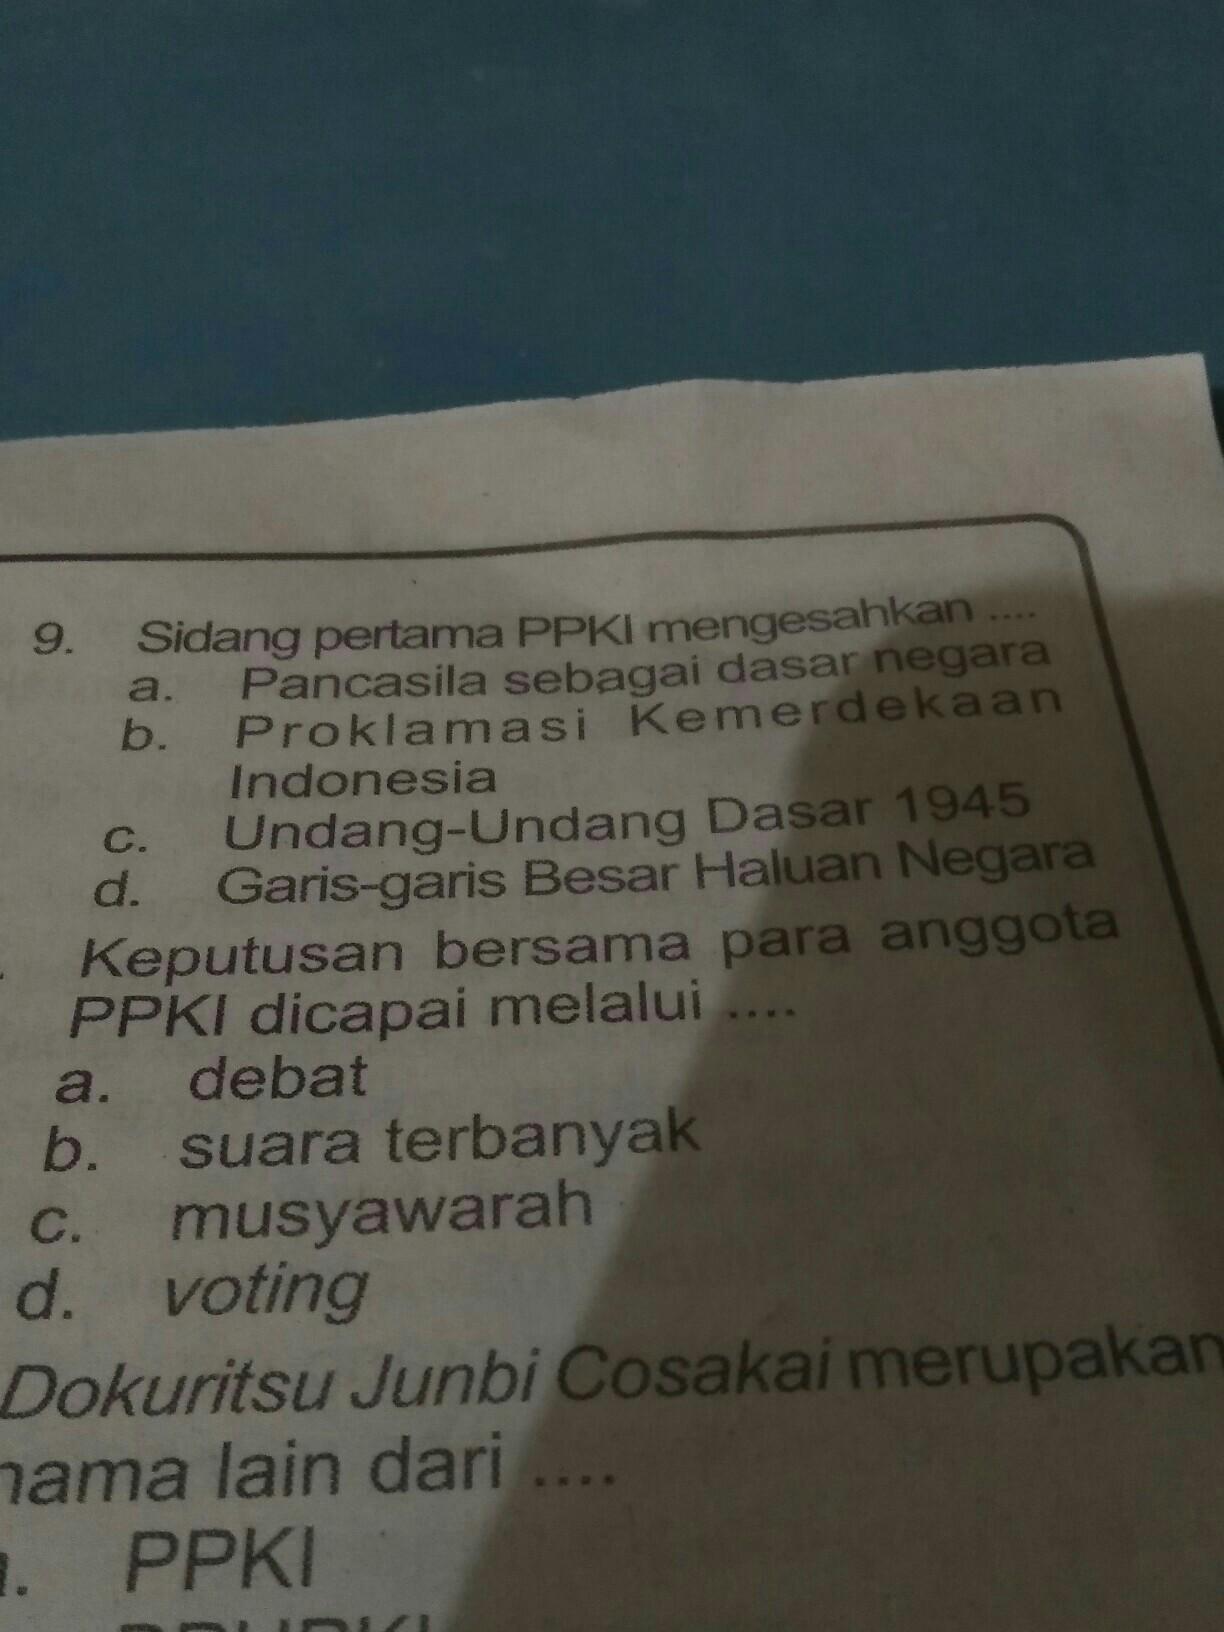 Kk Tolong Jawab Nomor 9 10 Pls Besok Di Kmpl Brainly Co Id